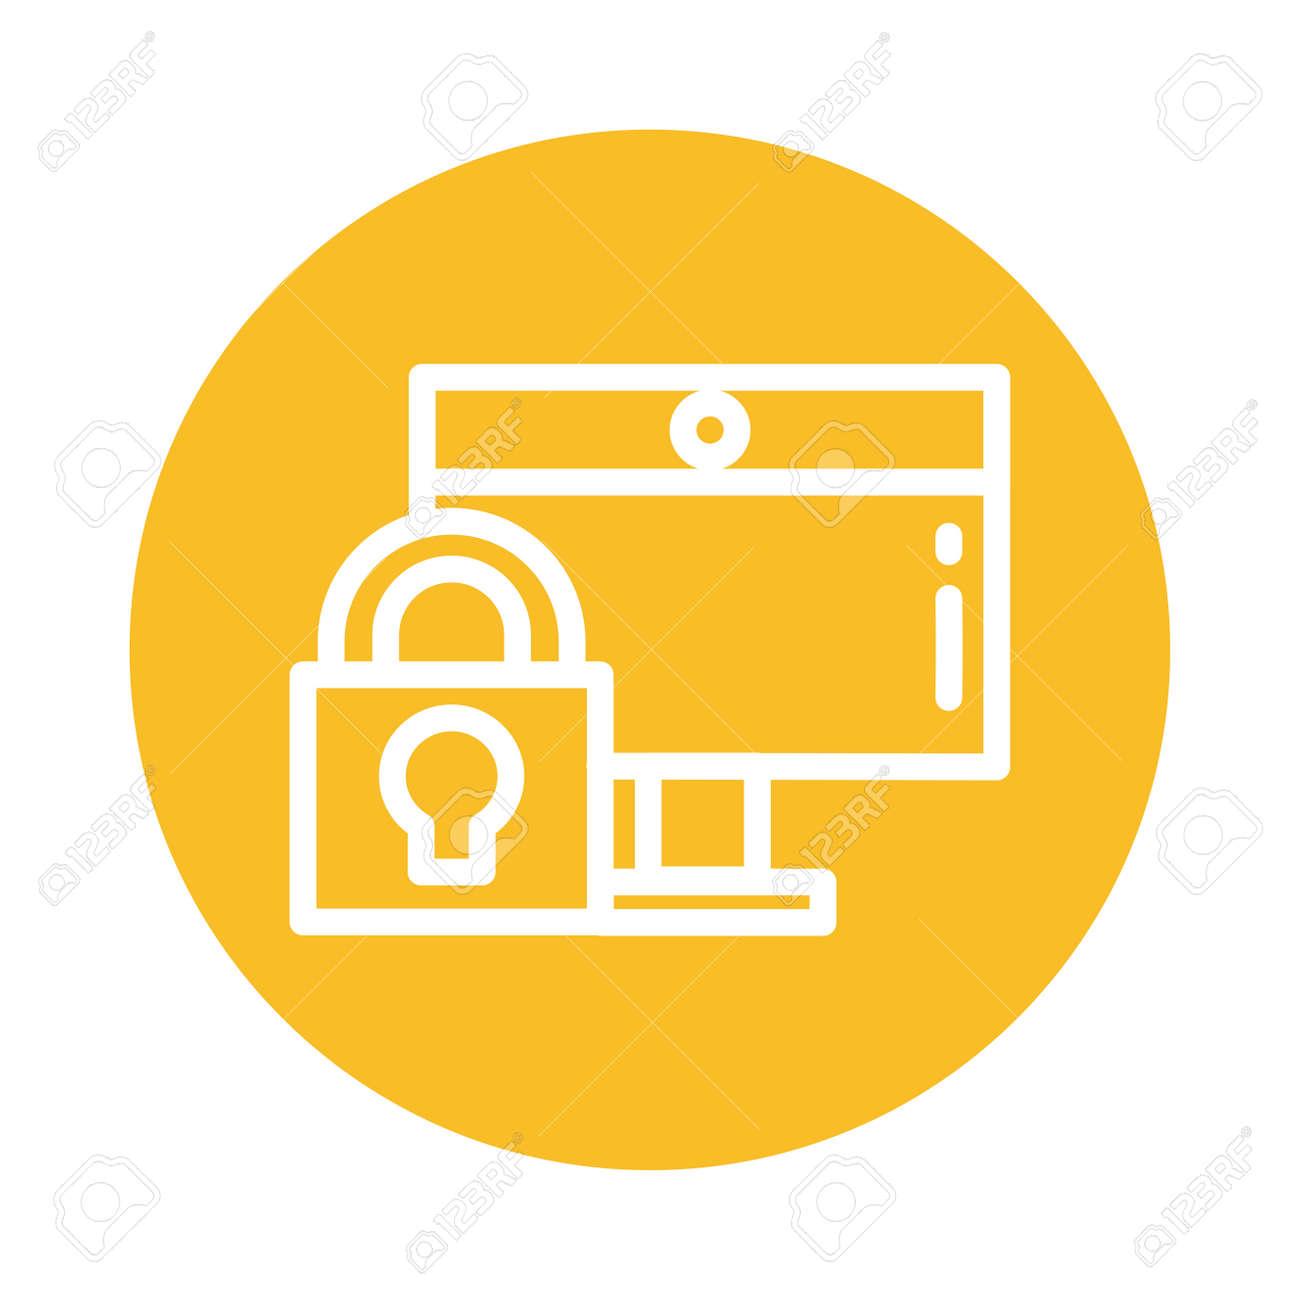 padlocked screen, block and flat style icon vector illustration design - 144411059